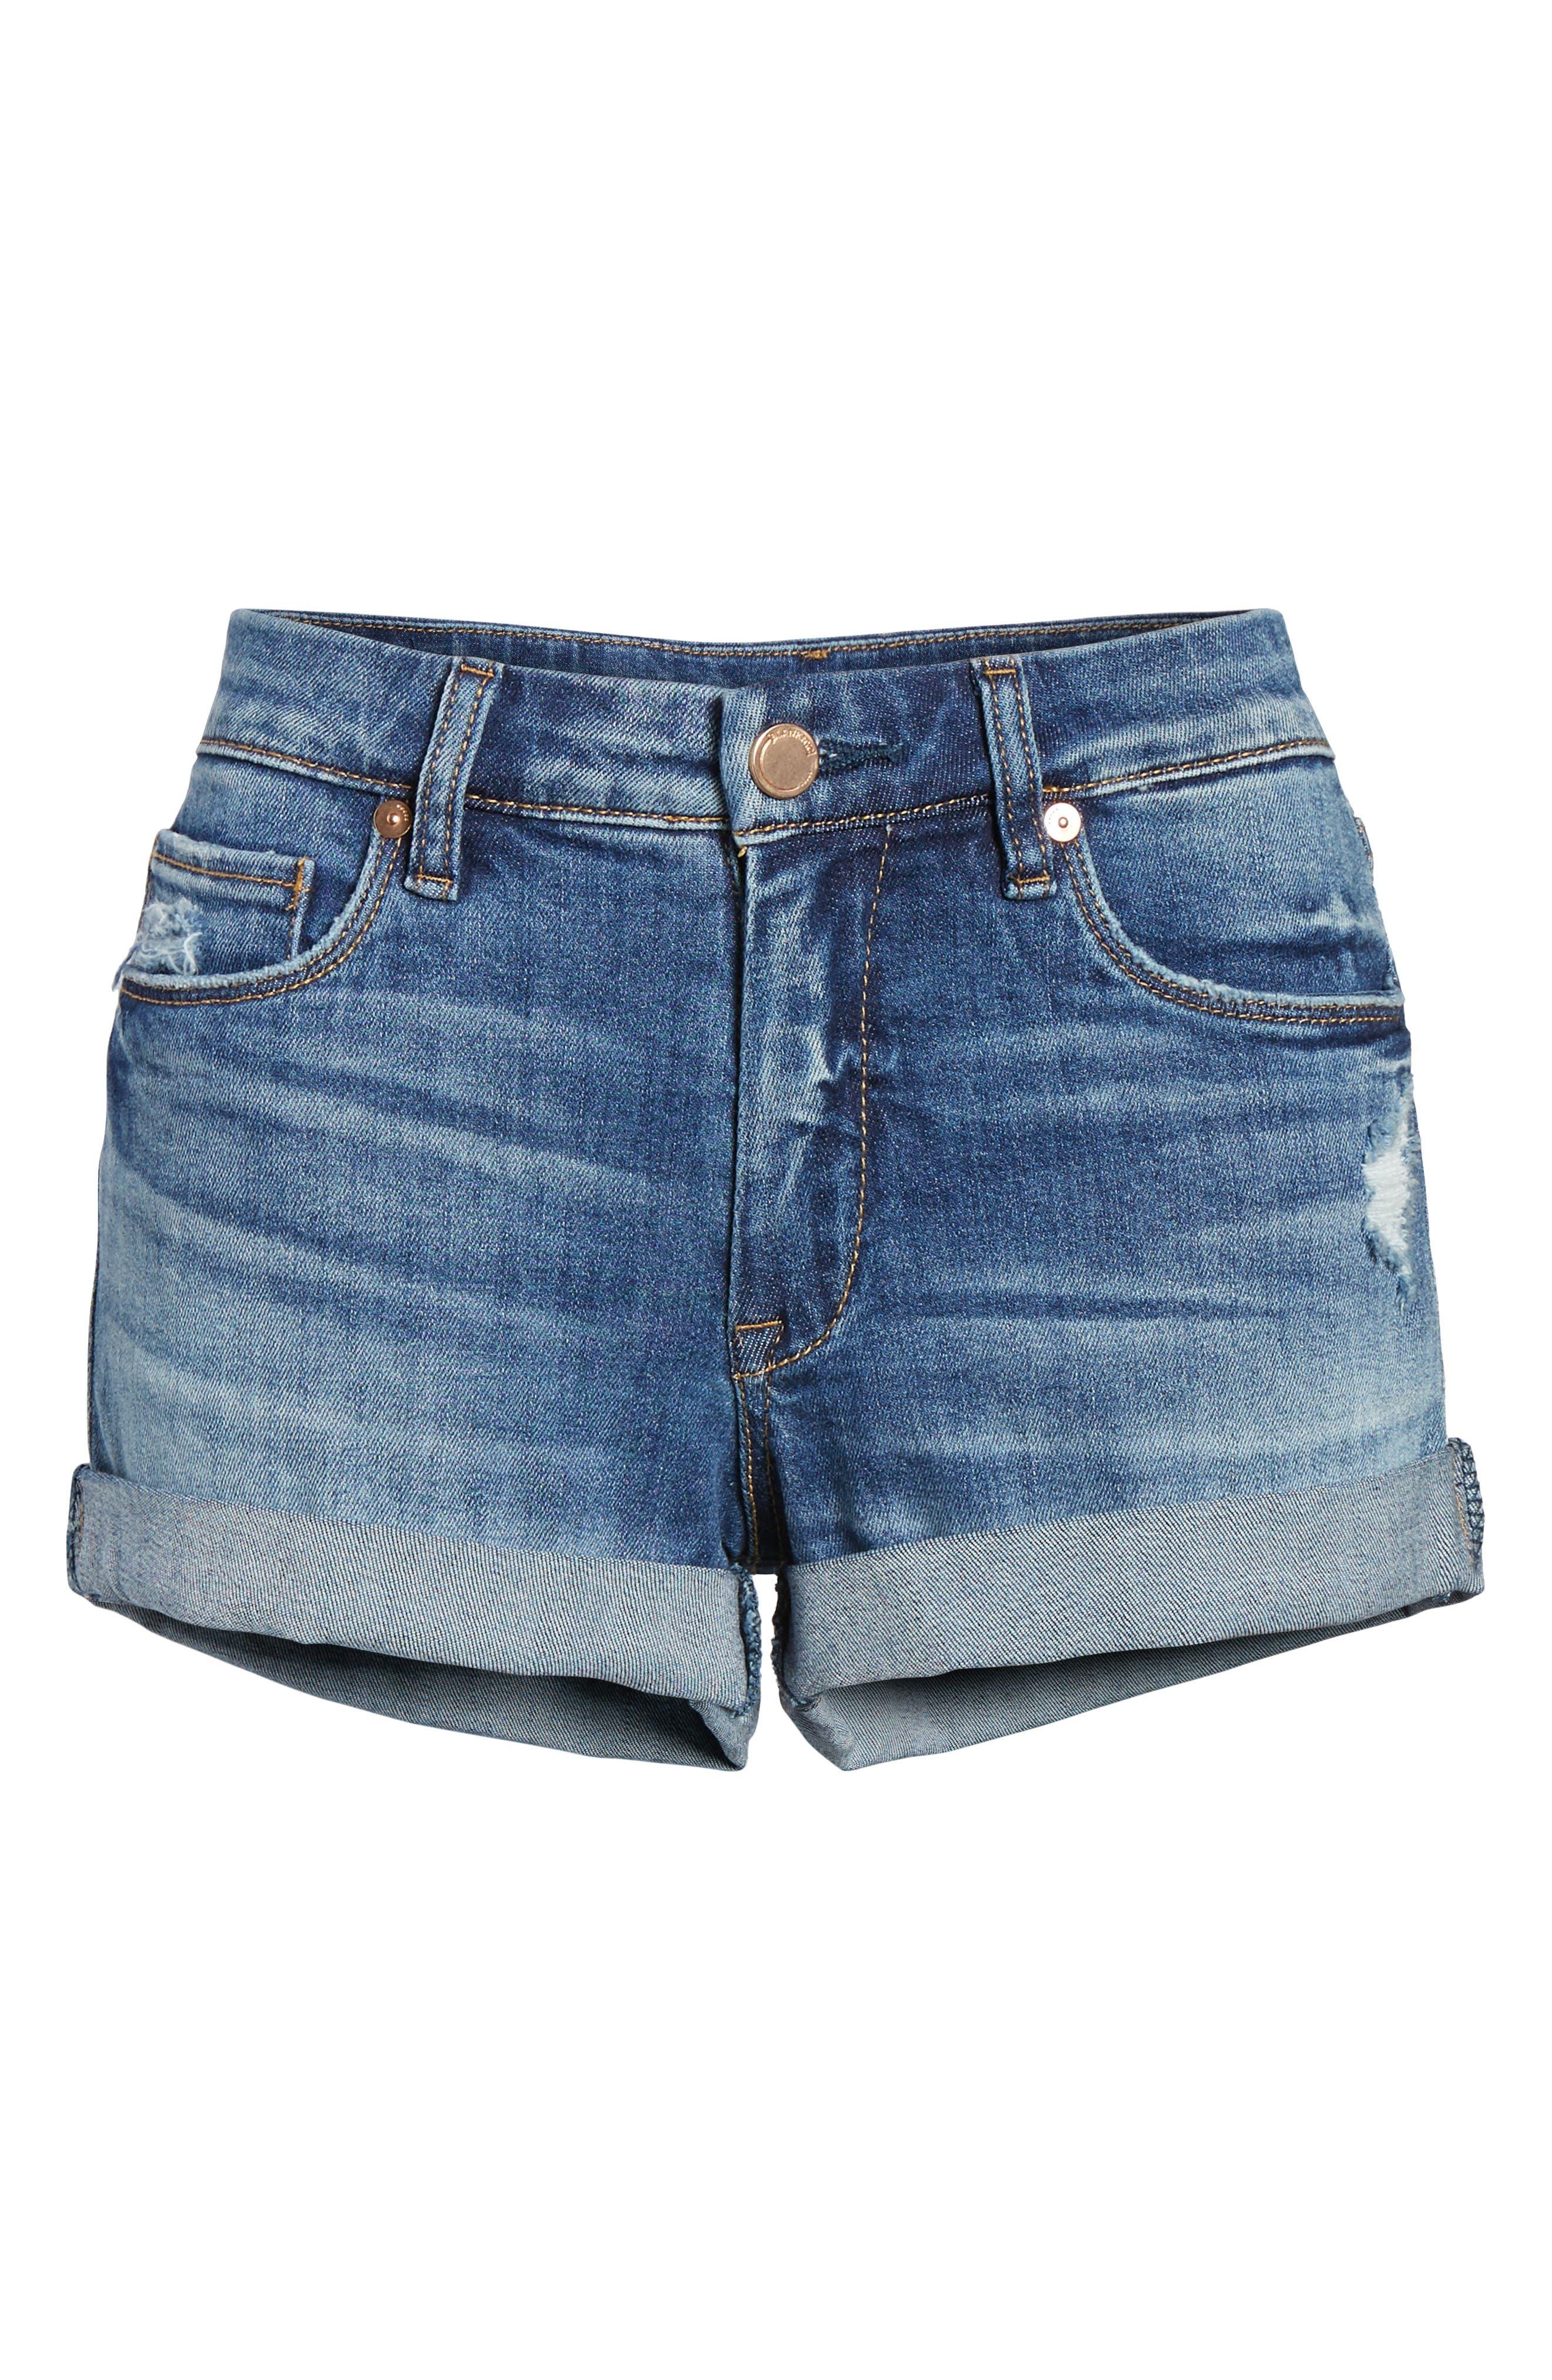 Plalay Hard Cuffed Jean Shorts,                             Alternate thumbnail 5, color,                             Blue